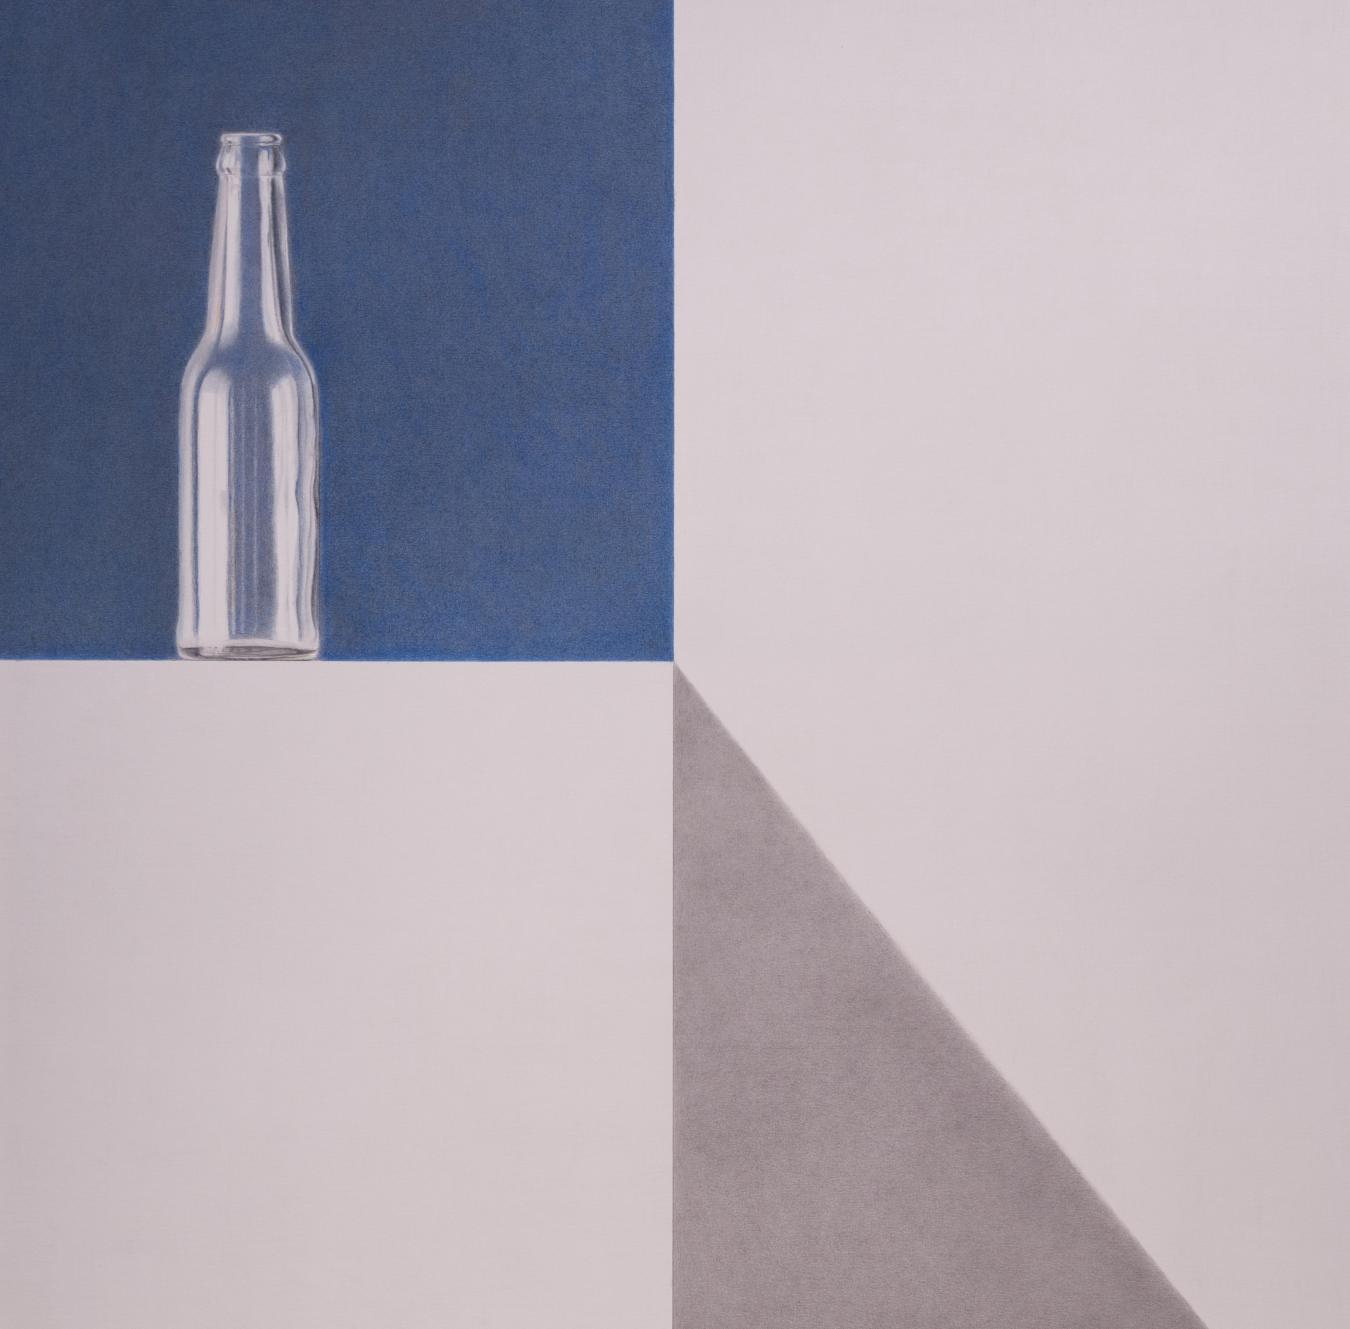 Botella sobre fondo azul (2020) - Angel Luis Muñoz Durán